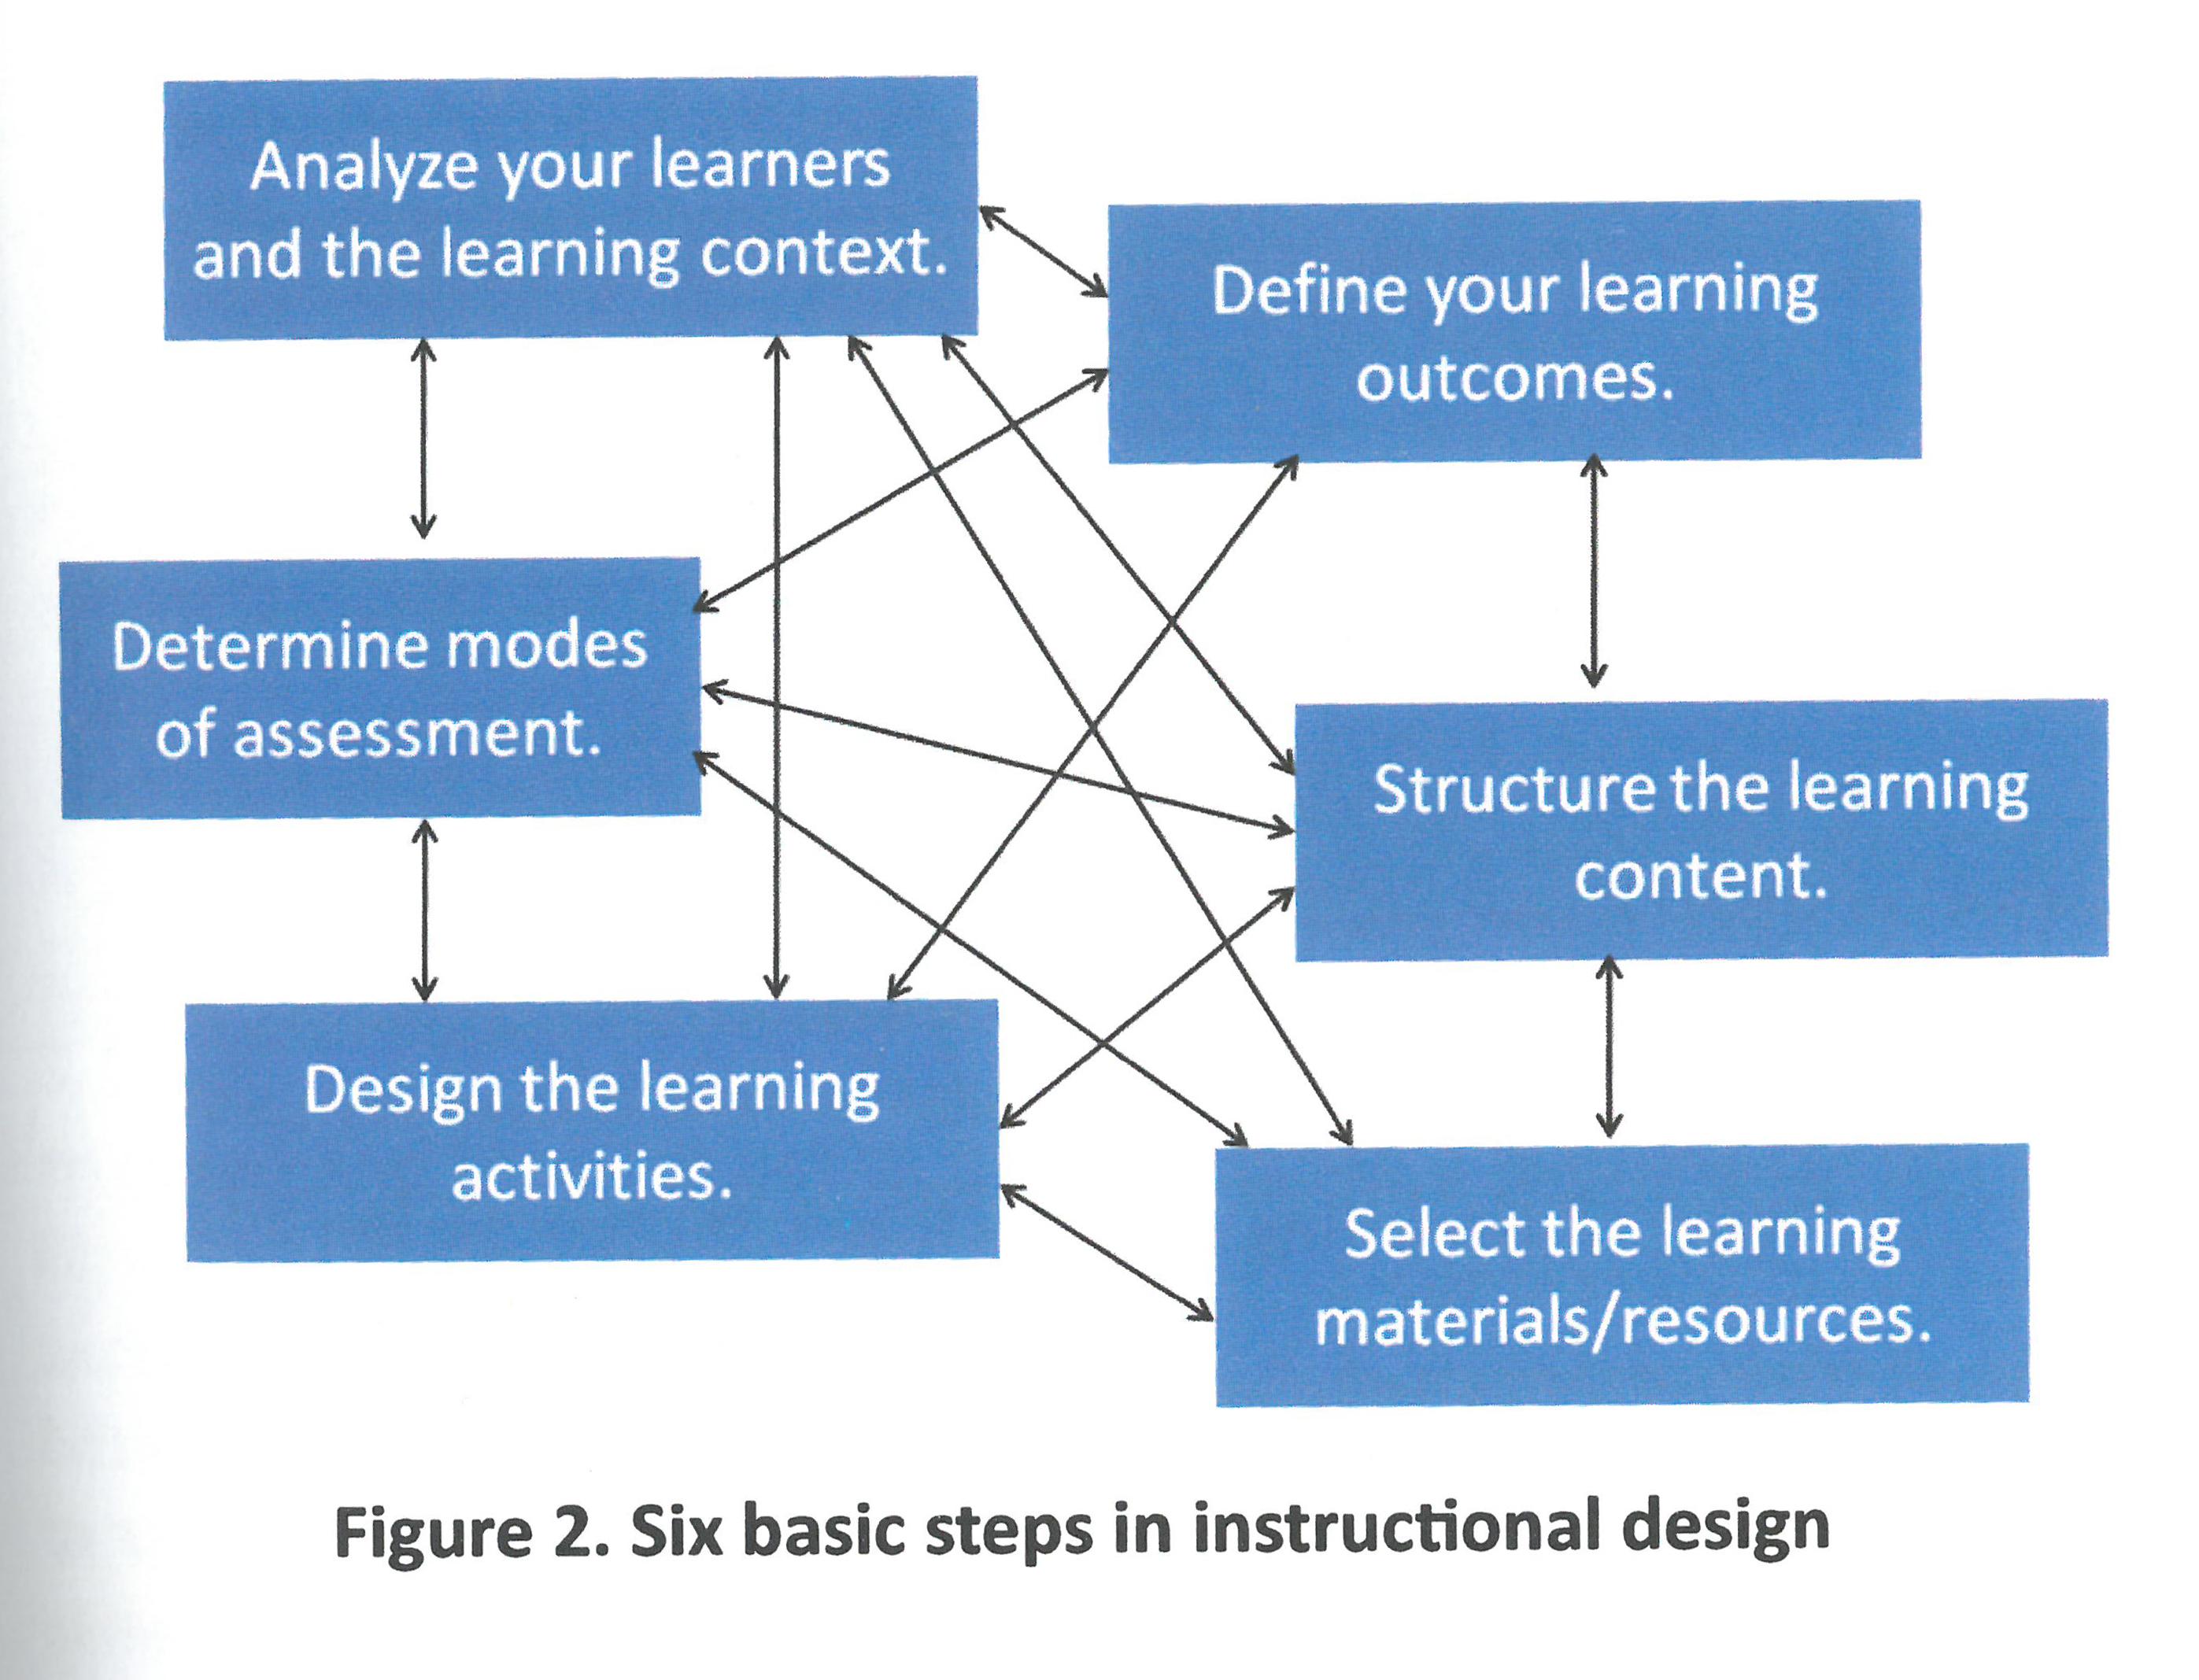 Six basic steps in instructional design